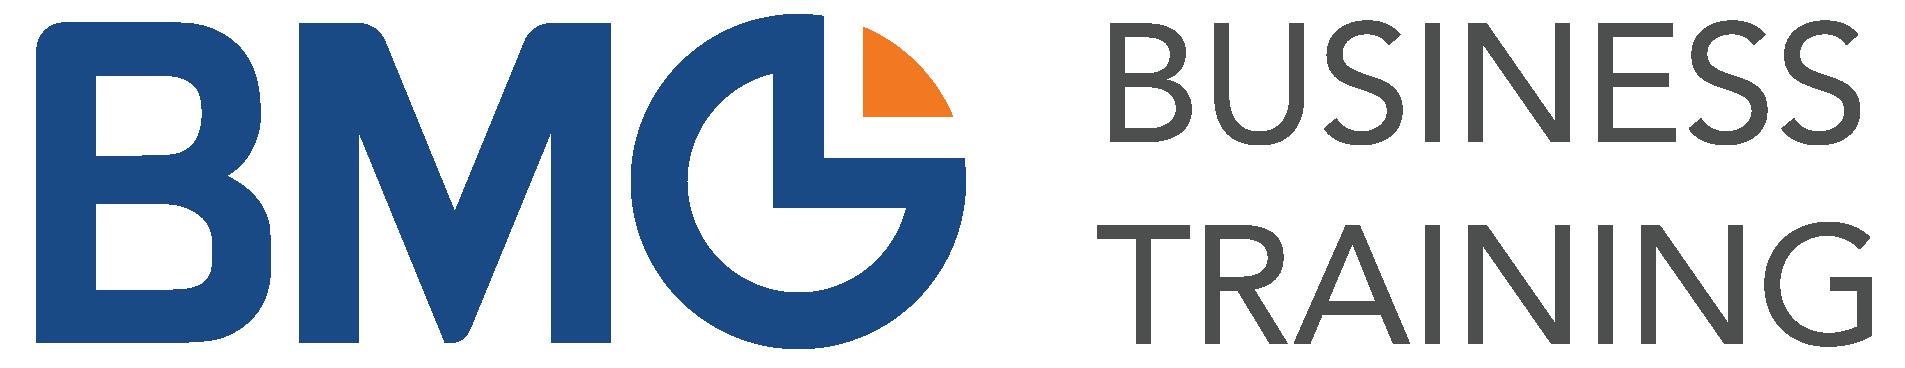 logo-trung-tam-nhat-ngu-huong-minh